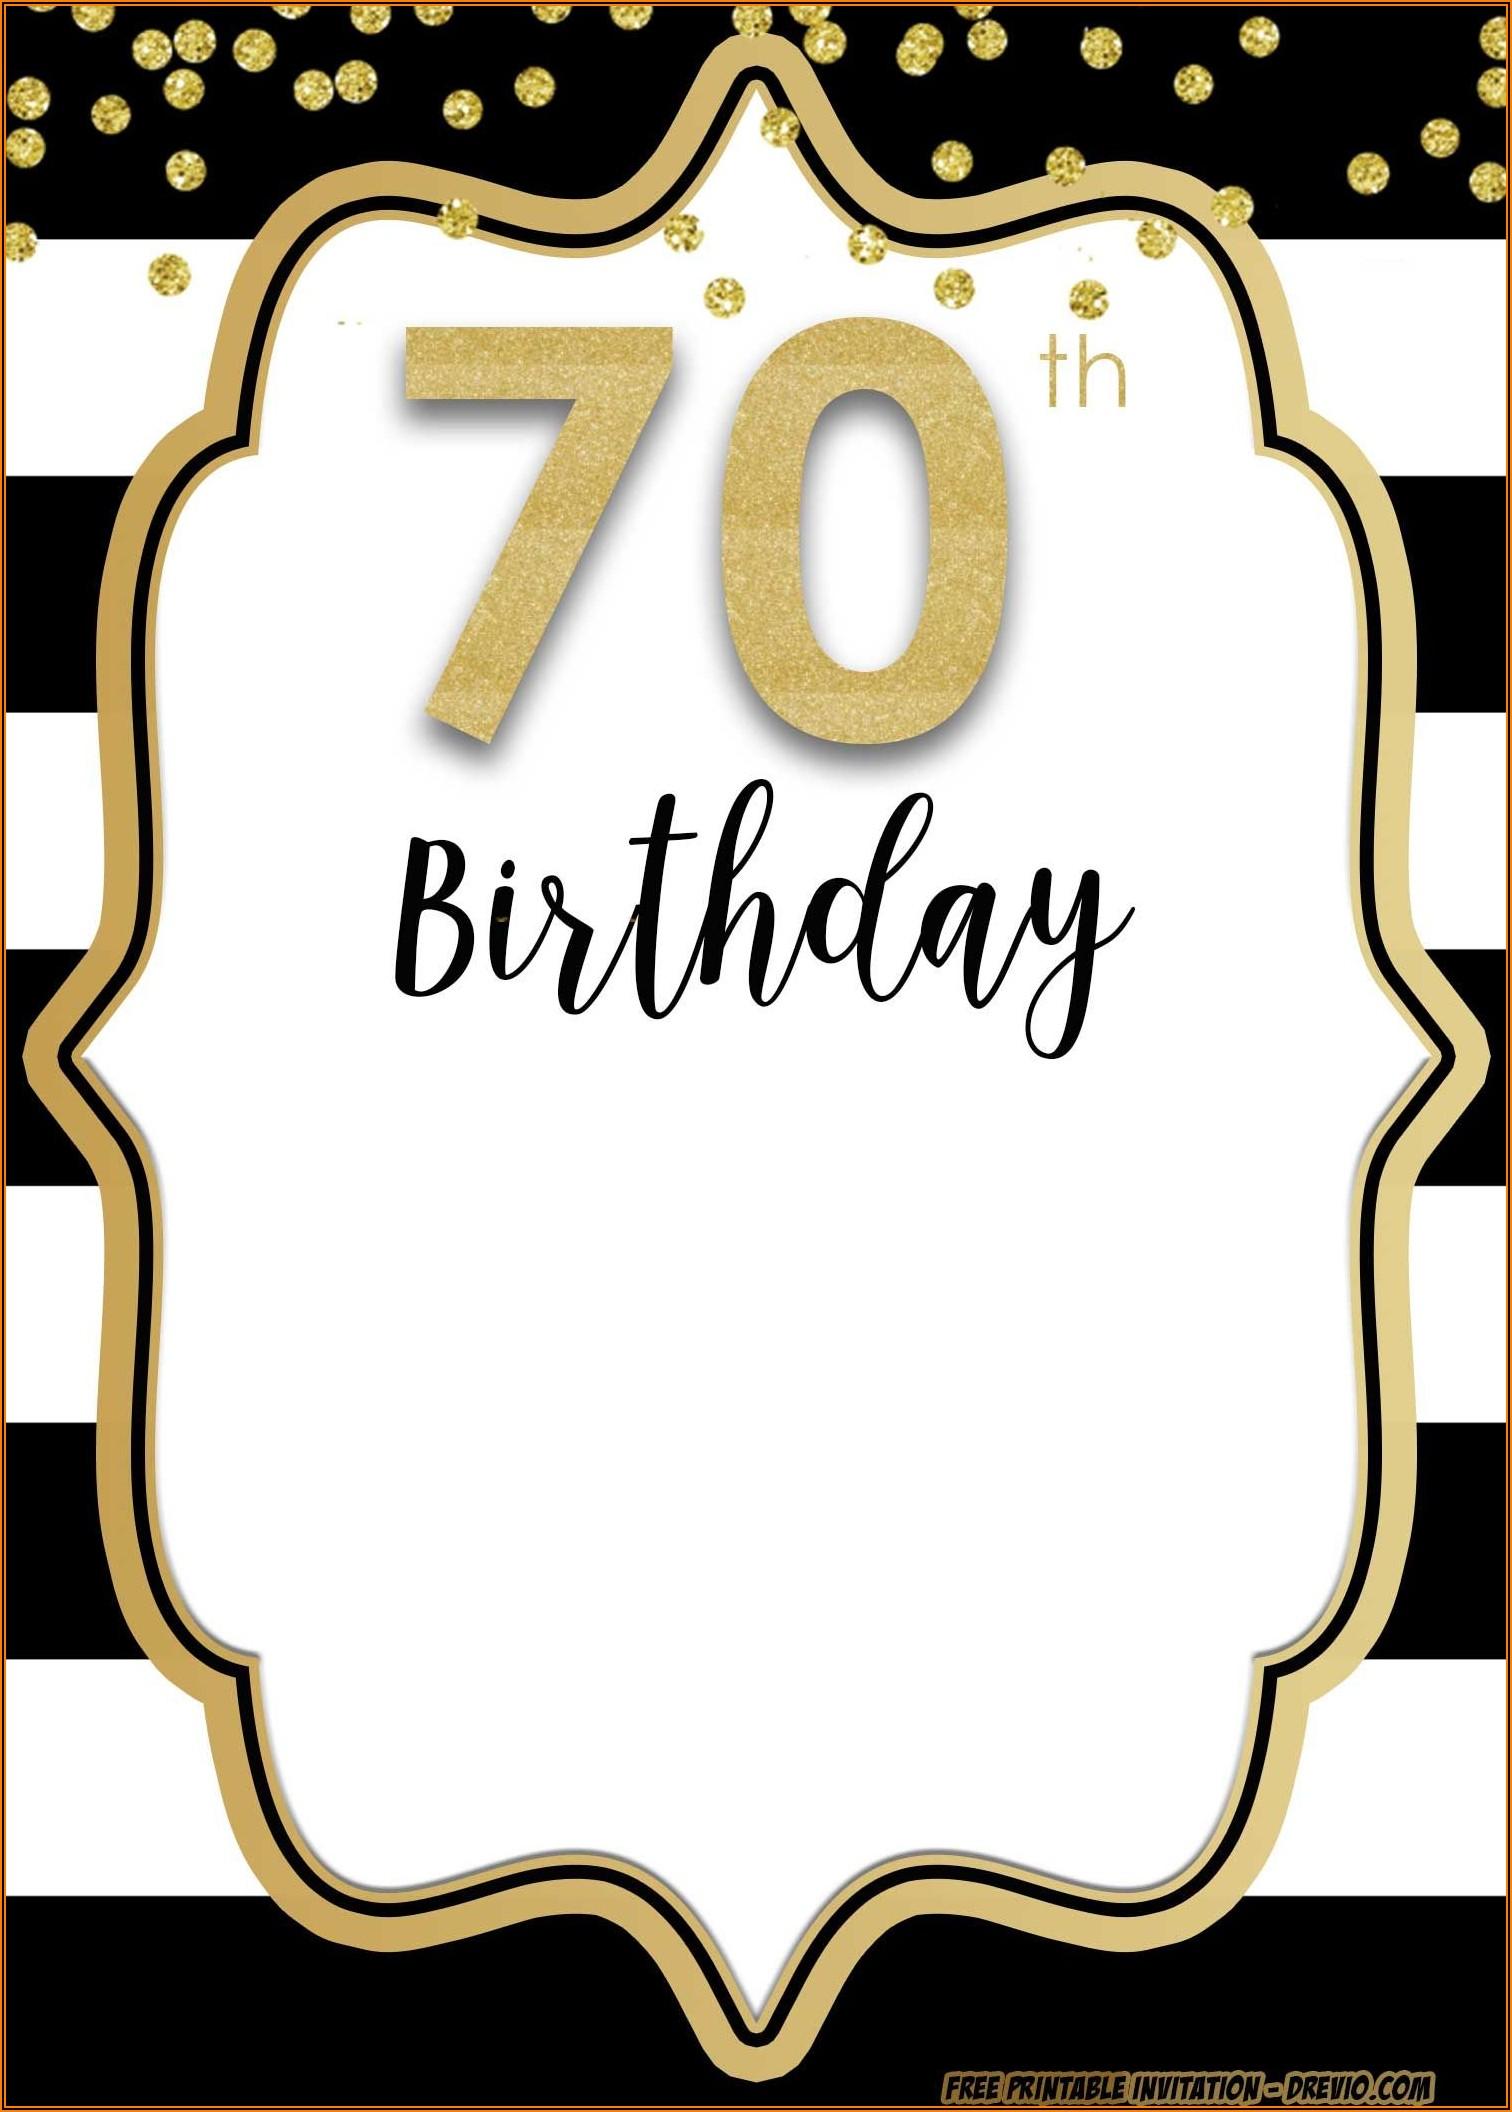 Gold Birthday Party Invitations Free Templates